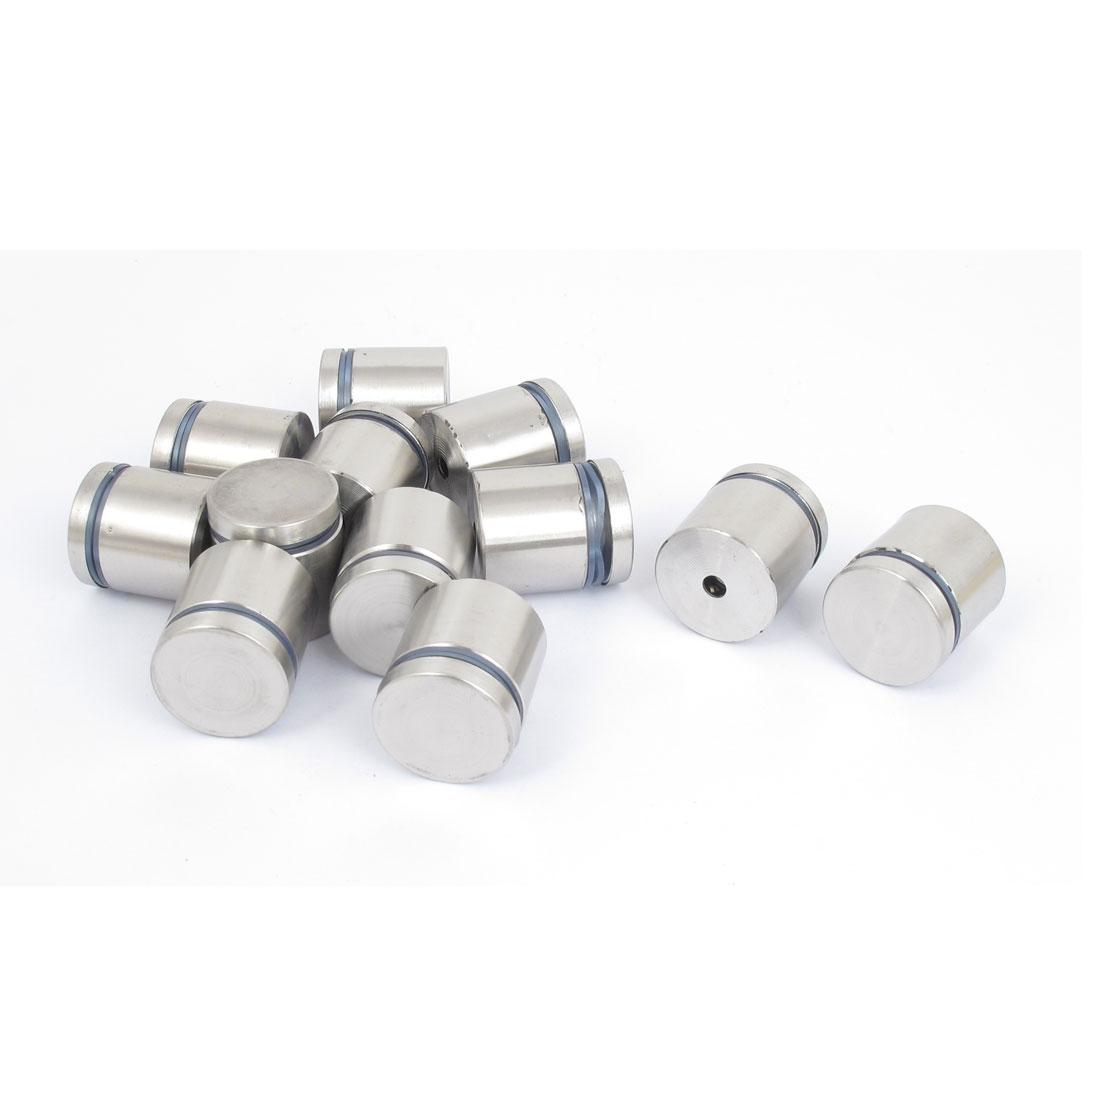 25mm x 25mm Stainless Steel Advertising Frameless Glass Standoff Pins 12pcs